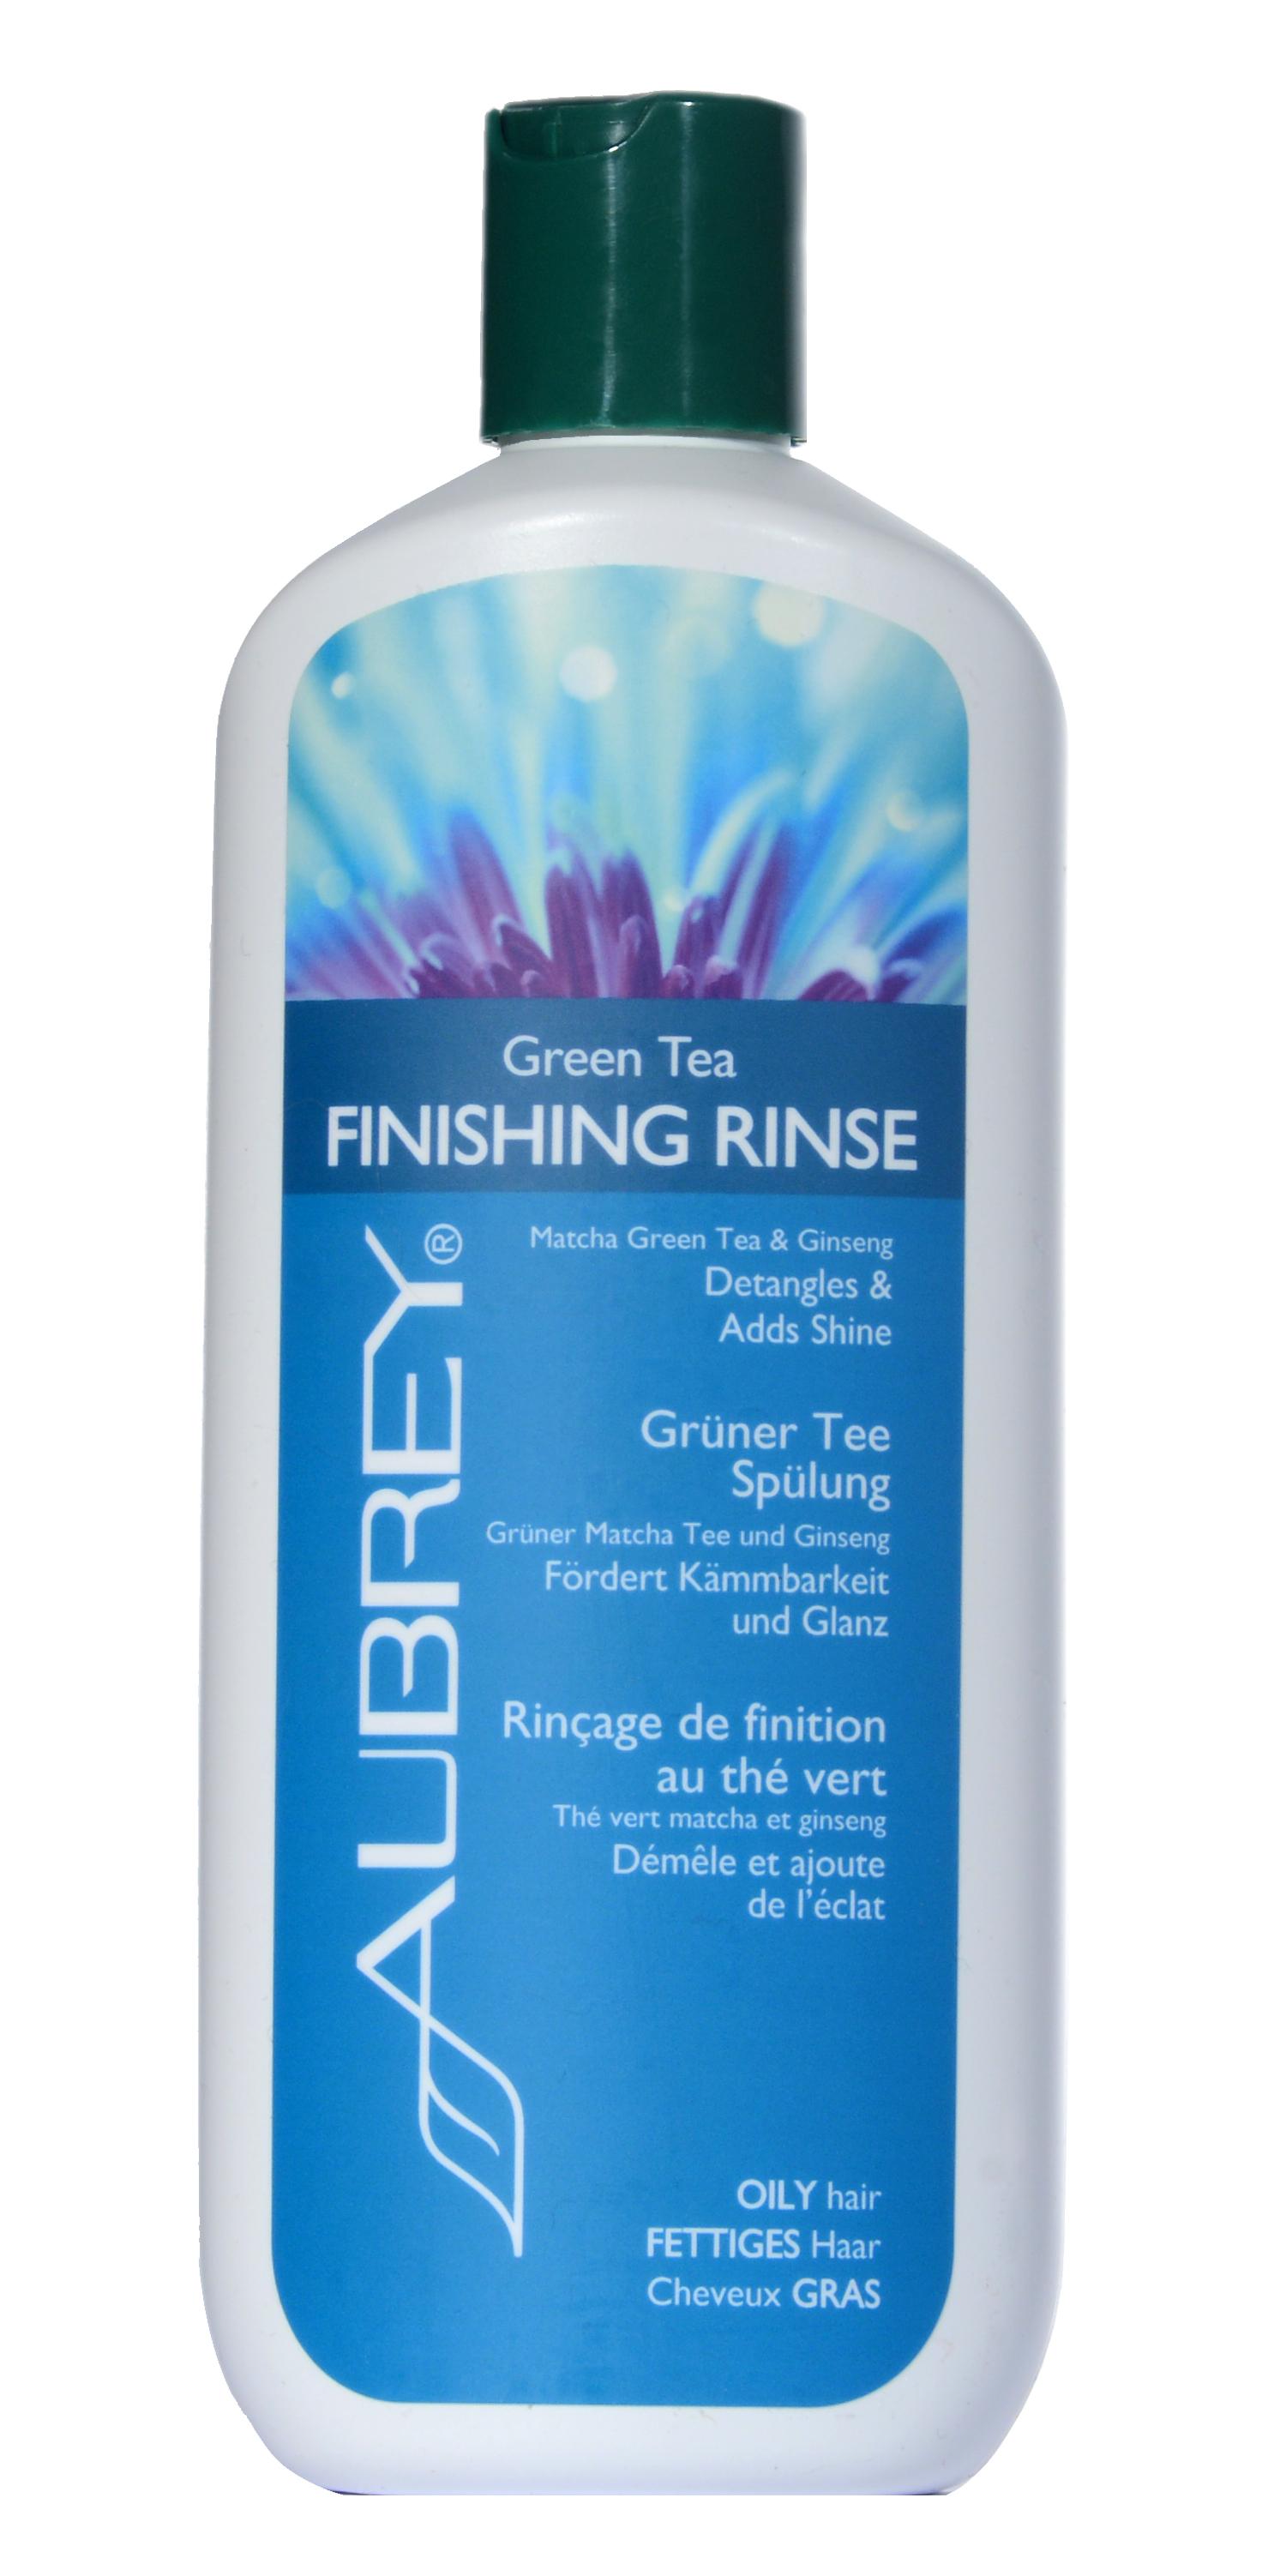 Green Tea Finishing Cream Rinse for Oily Hair 325ml